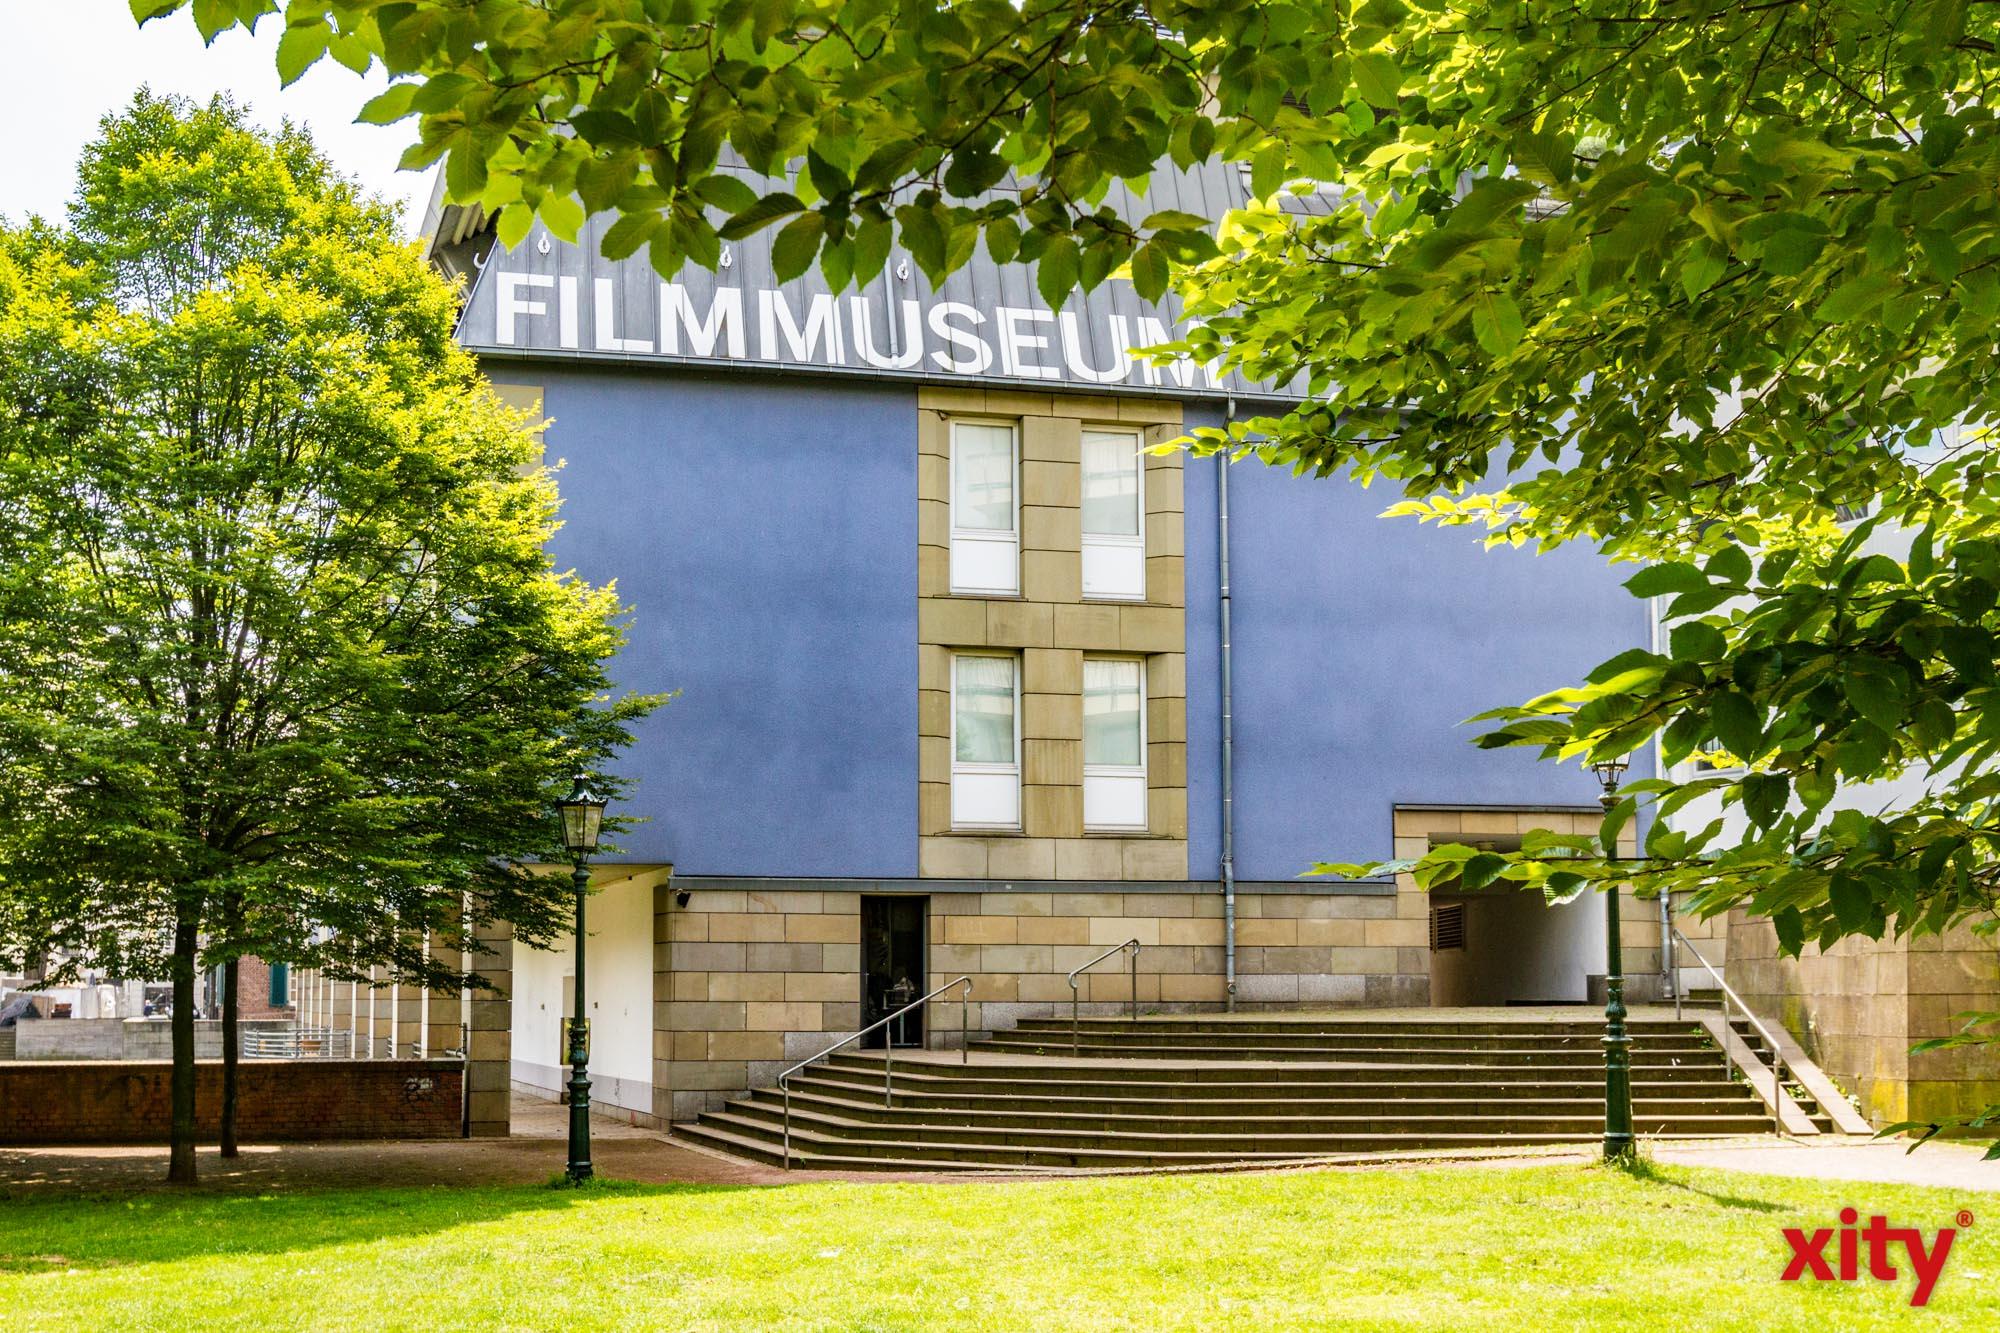 Umbau im Filmmuseum Düsseldorf: Kinostühle abzugeben (Foto: xity)